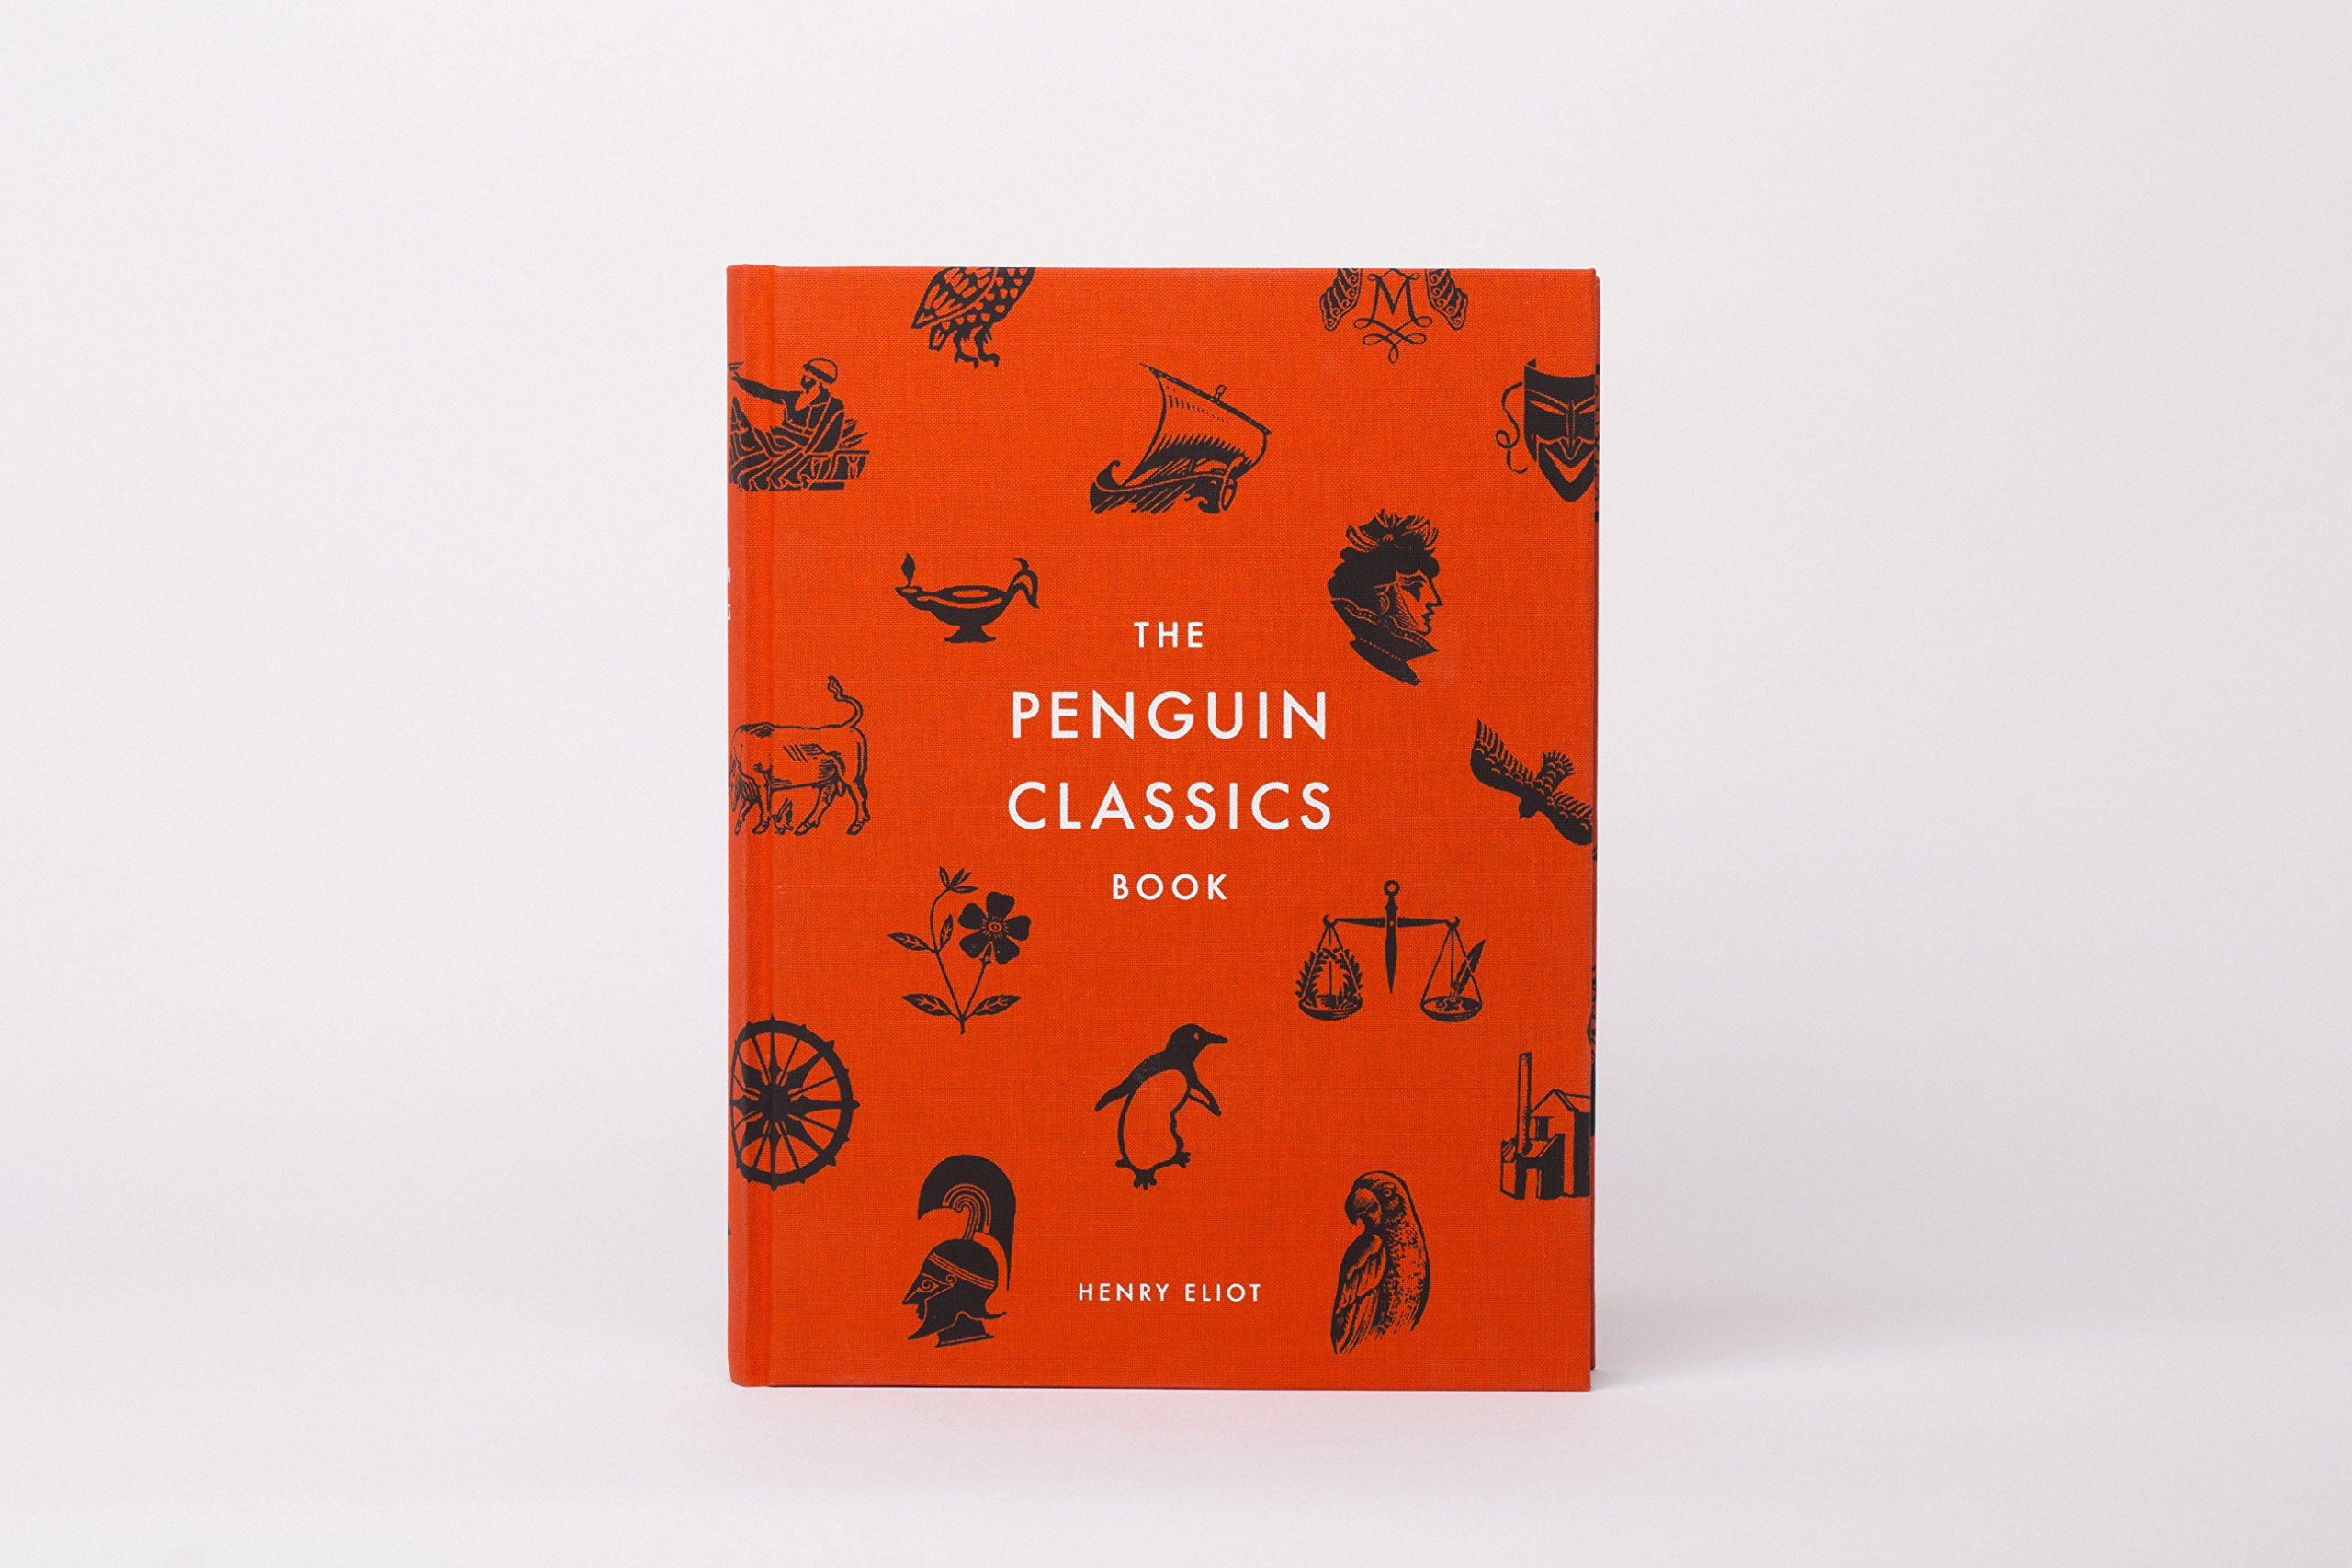 Penguin Classics: The Book Of 1350 Books: Amazon.es: Henry Eliot, Henry Eliot: Libros en idiomas extranjeros